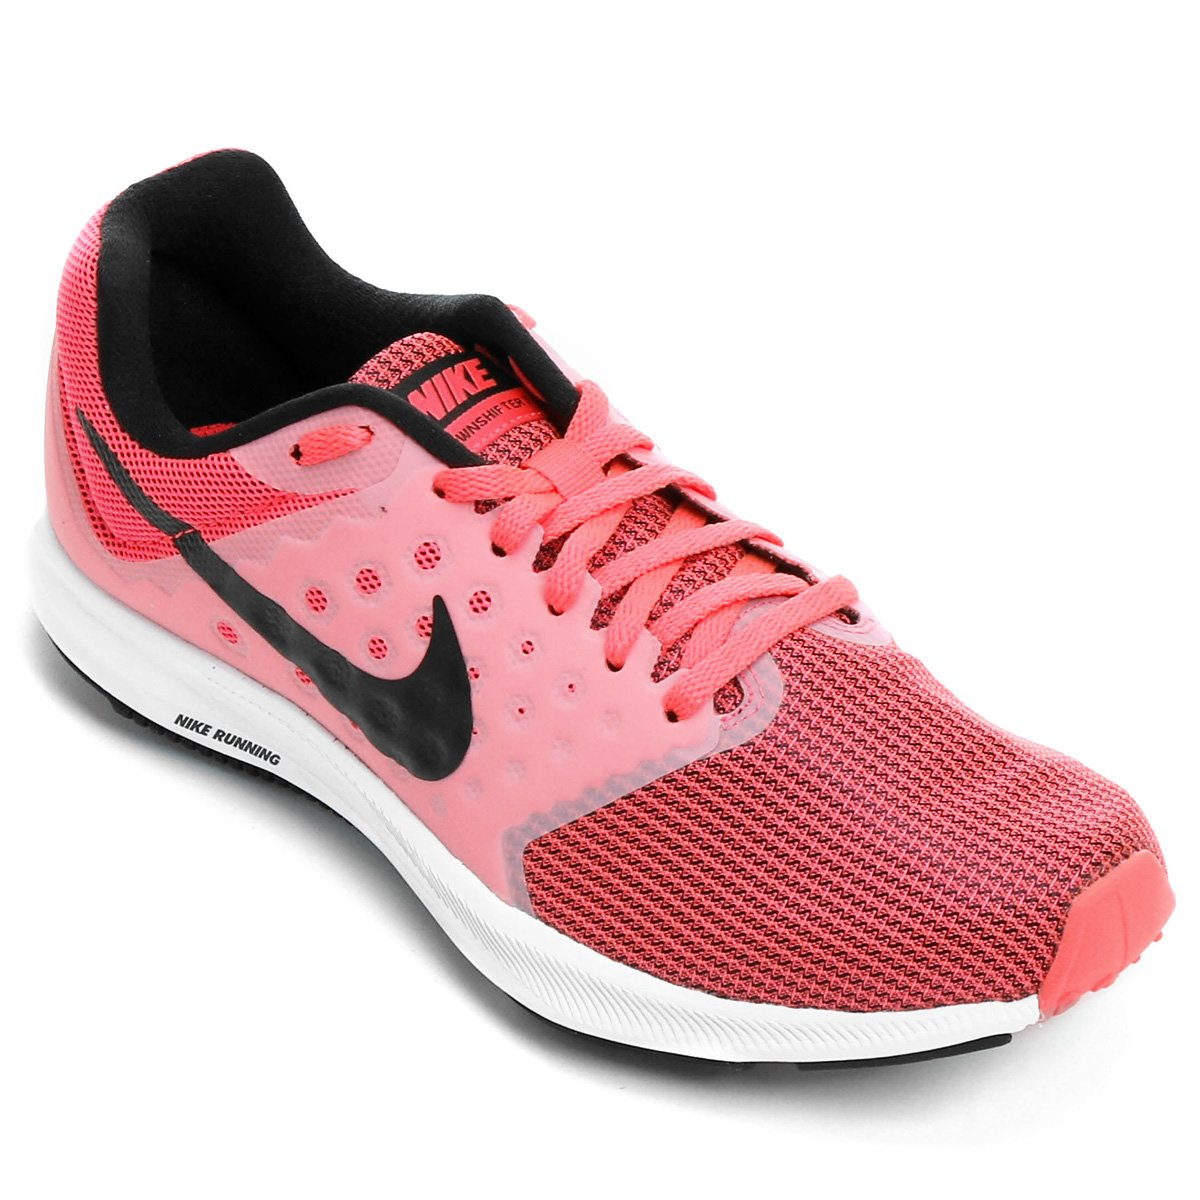 e9748595aa Tênis Nike Downshifter 7 Feminino - Rosa e Preto - Compre Agora ...